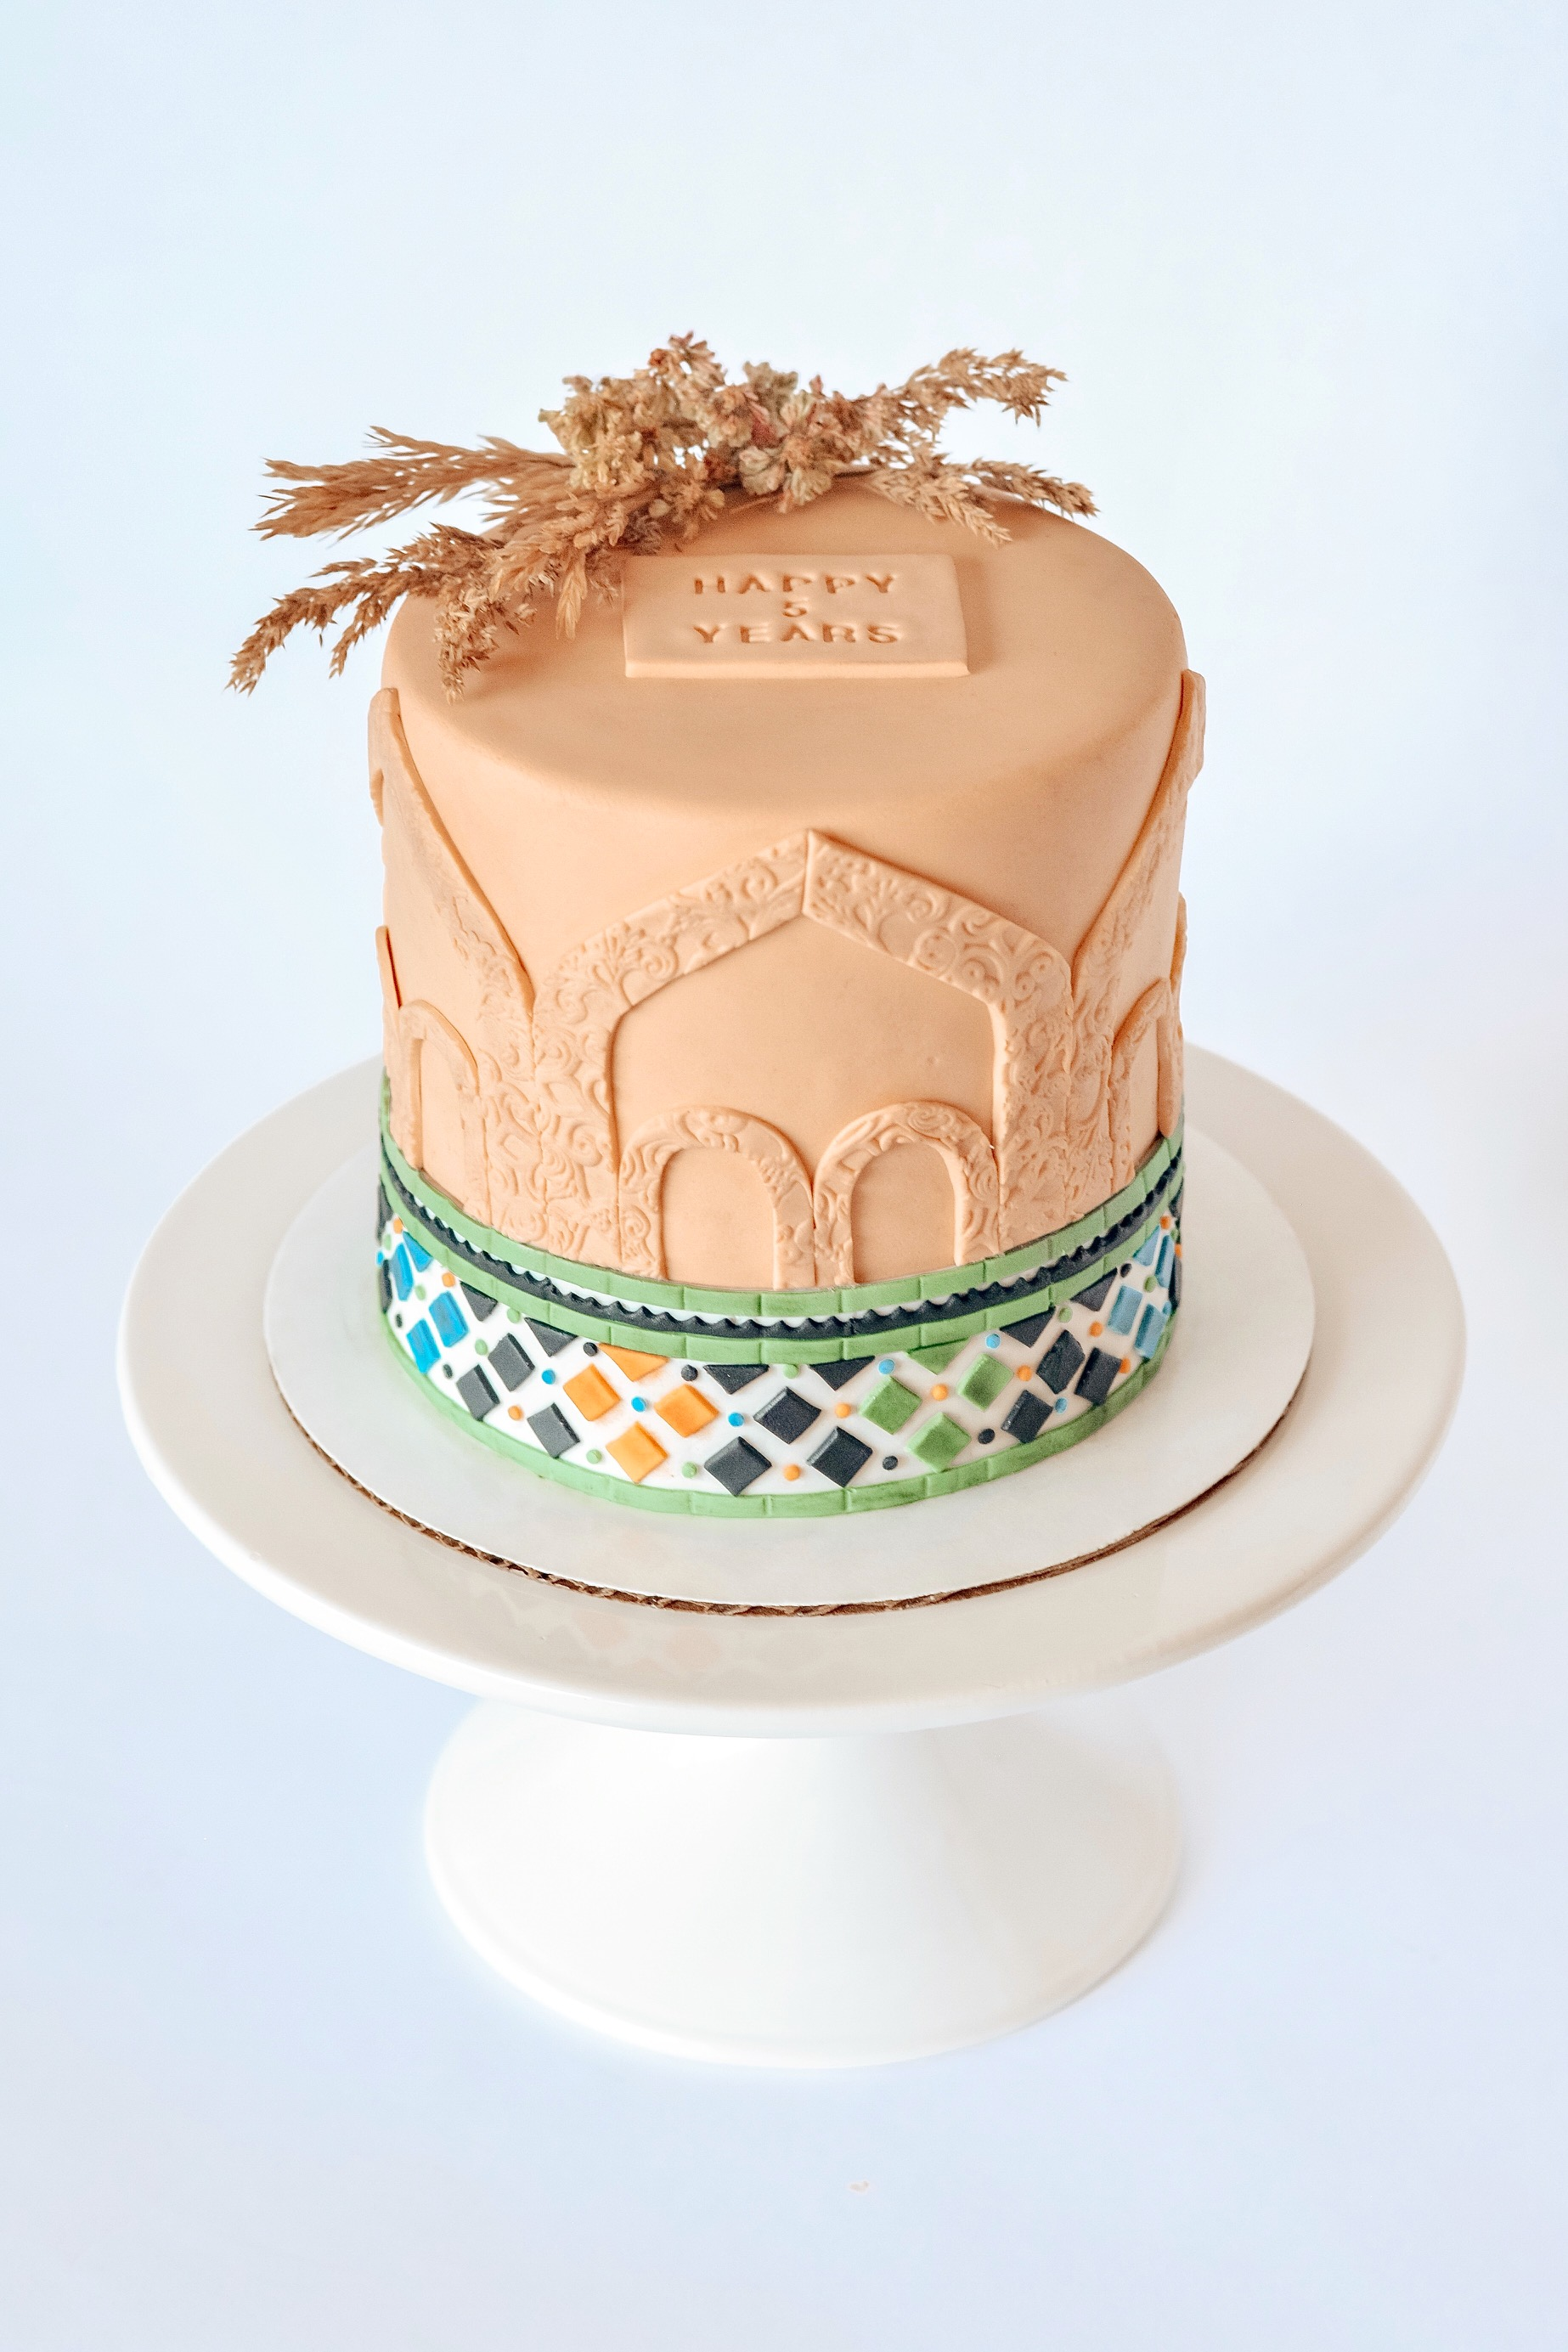 Spain Themed Cake